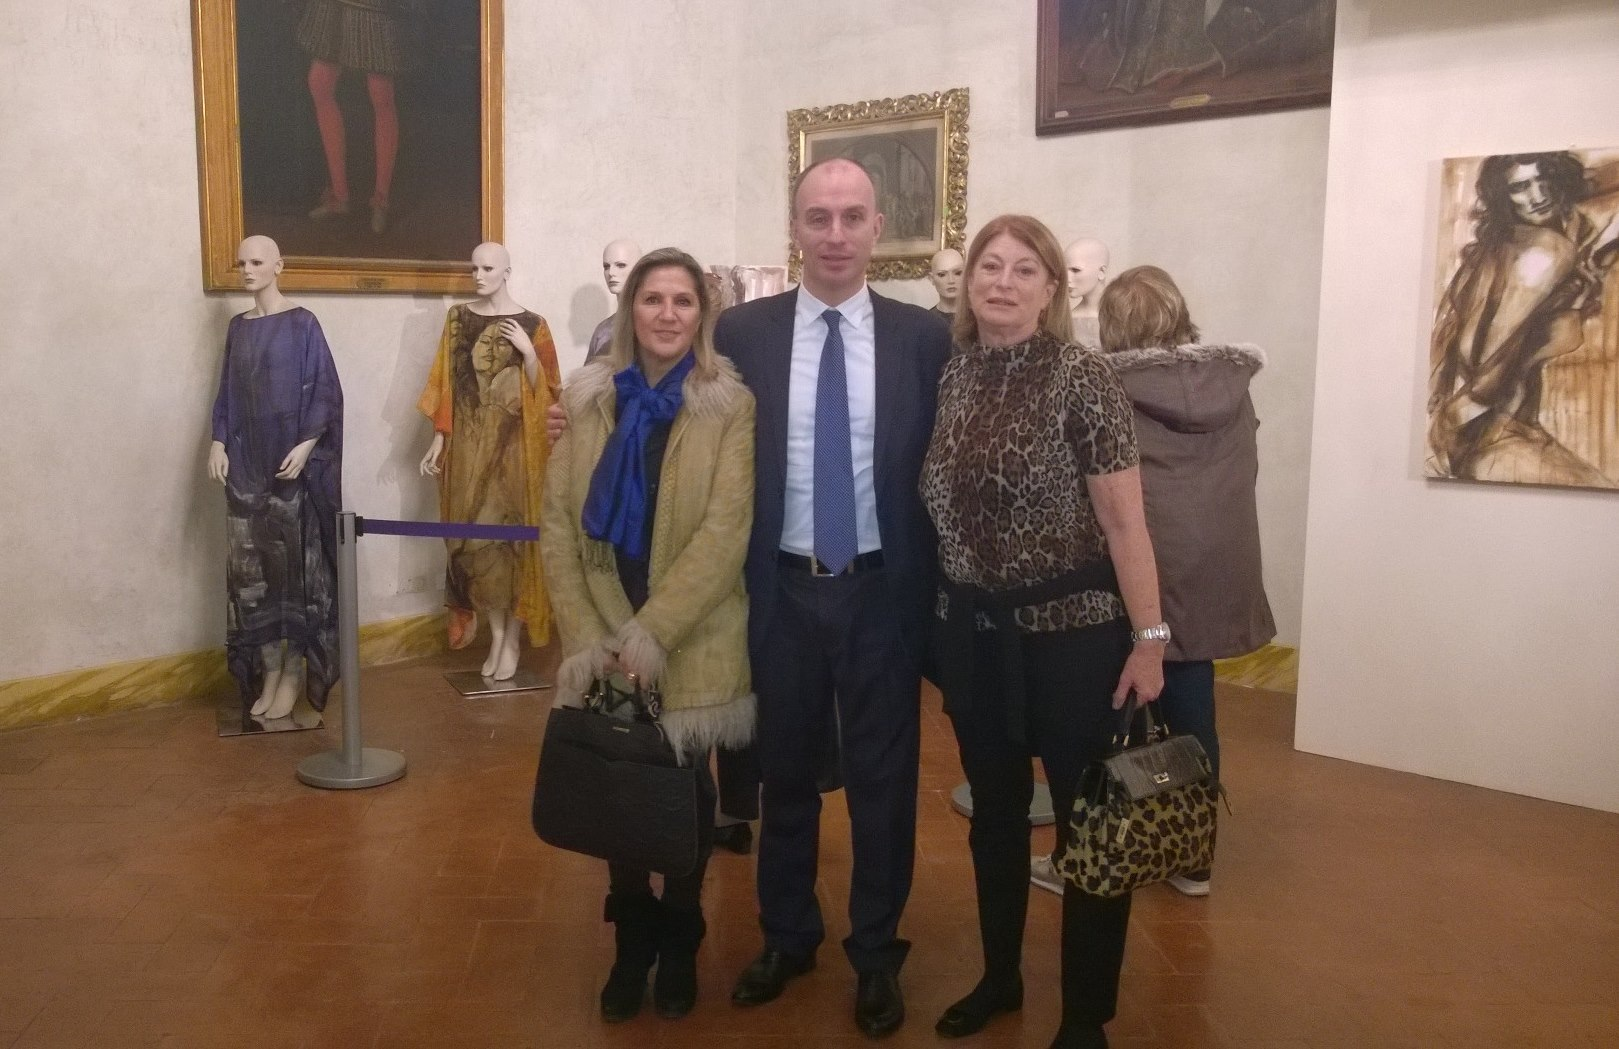 Firenze, 29 Novembre 2014, con Elisabetta Rogai